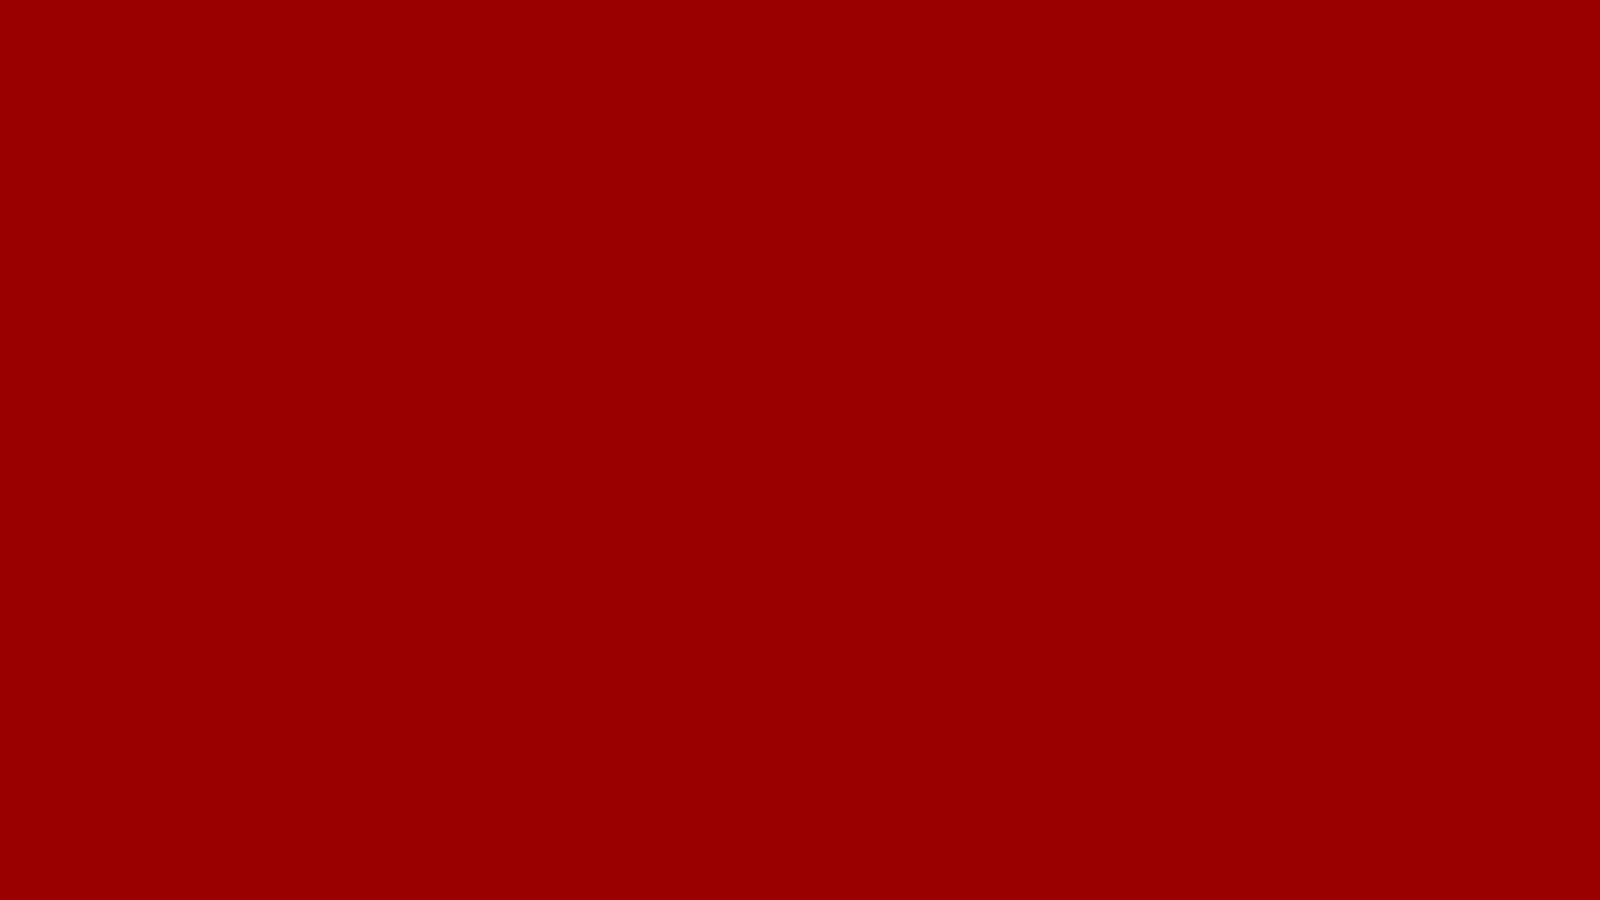 1600x900 Stizza Solid Color Background